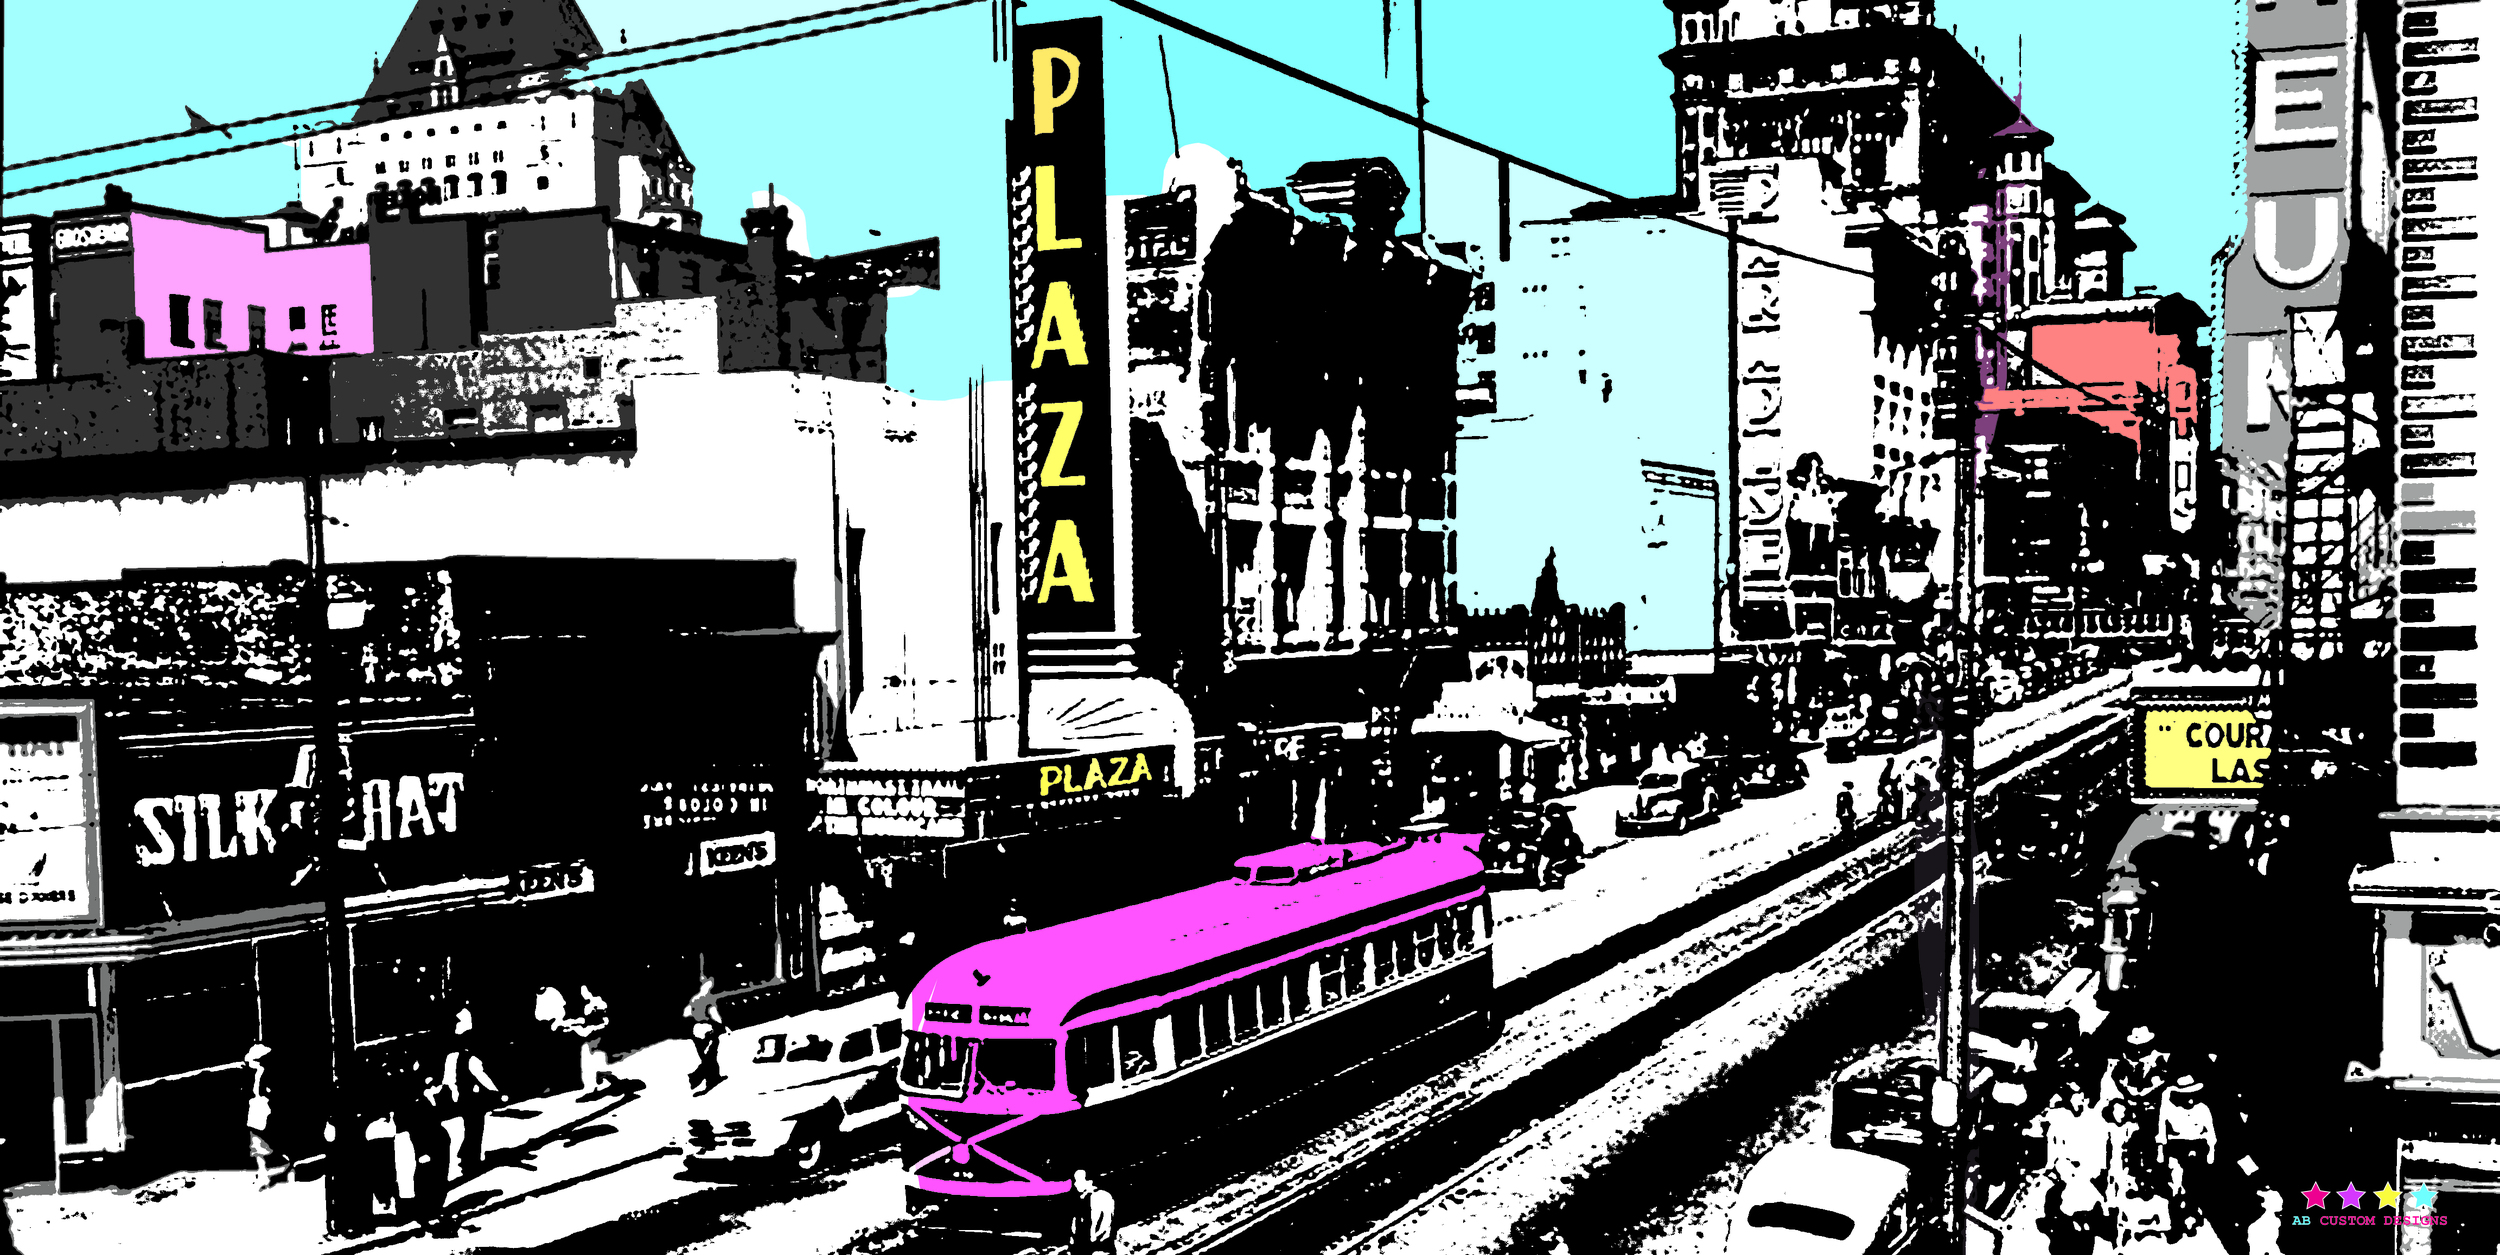 "Granville Street 24""x48"". Fine Art Photography on Plexiglas. & Printer's Proof Available 24""x48"" framed."